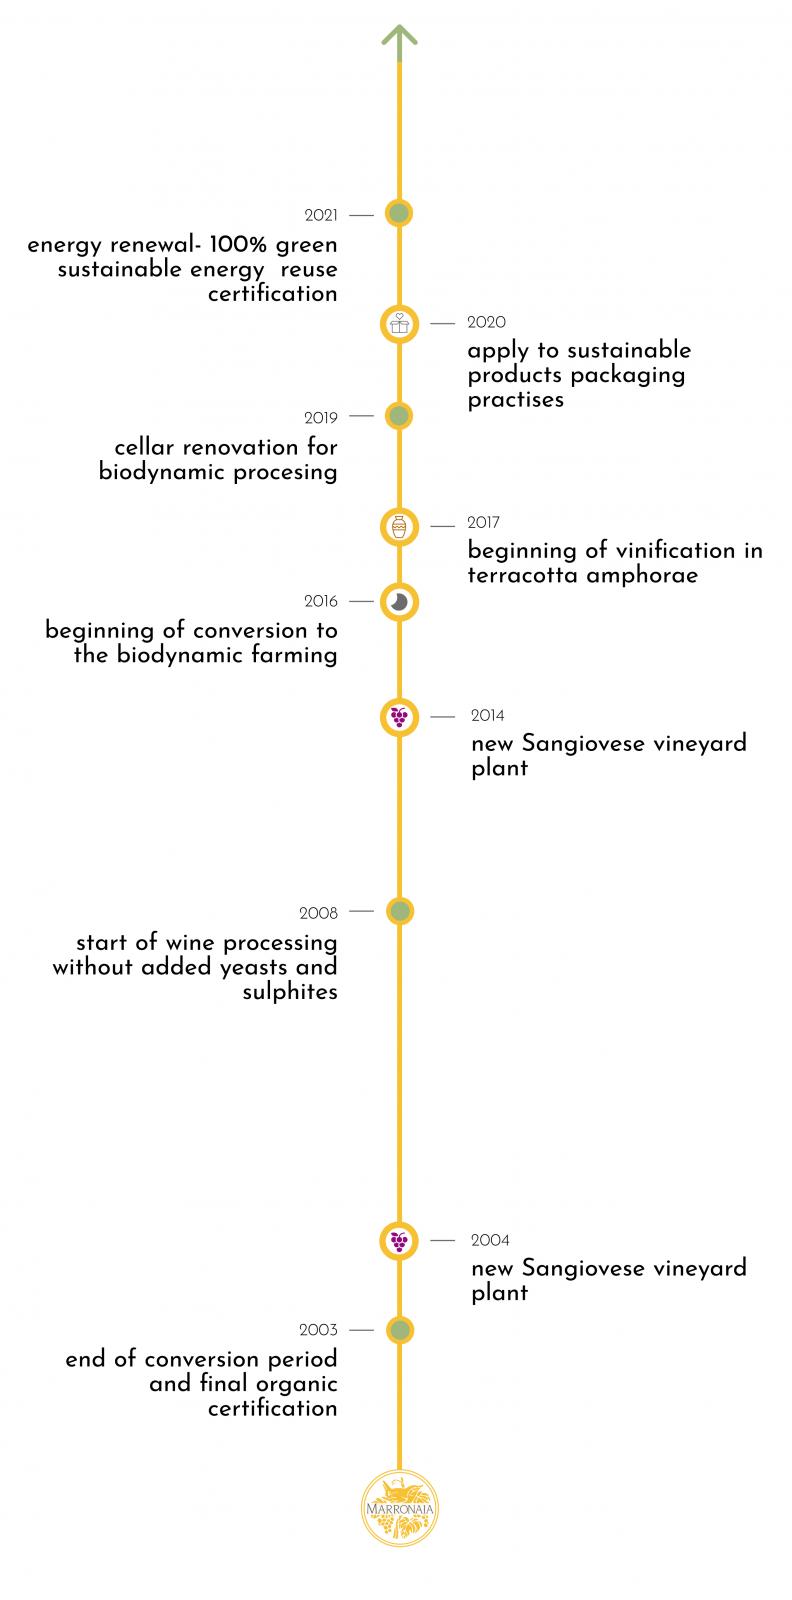 Timeline - La Marronaia - biodynamic